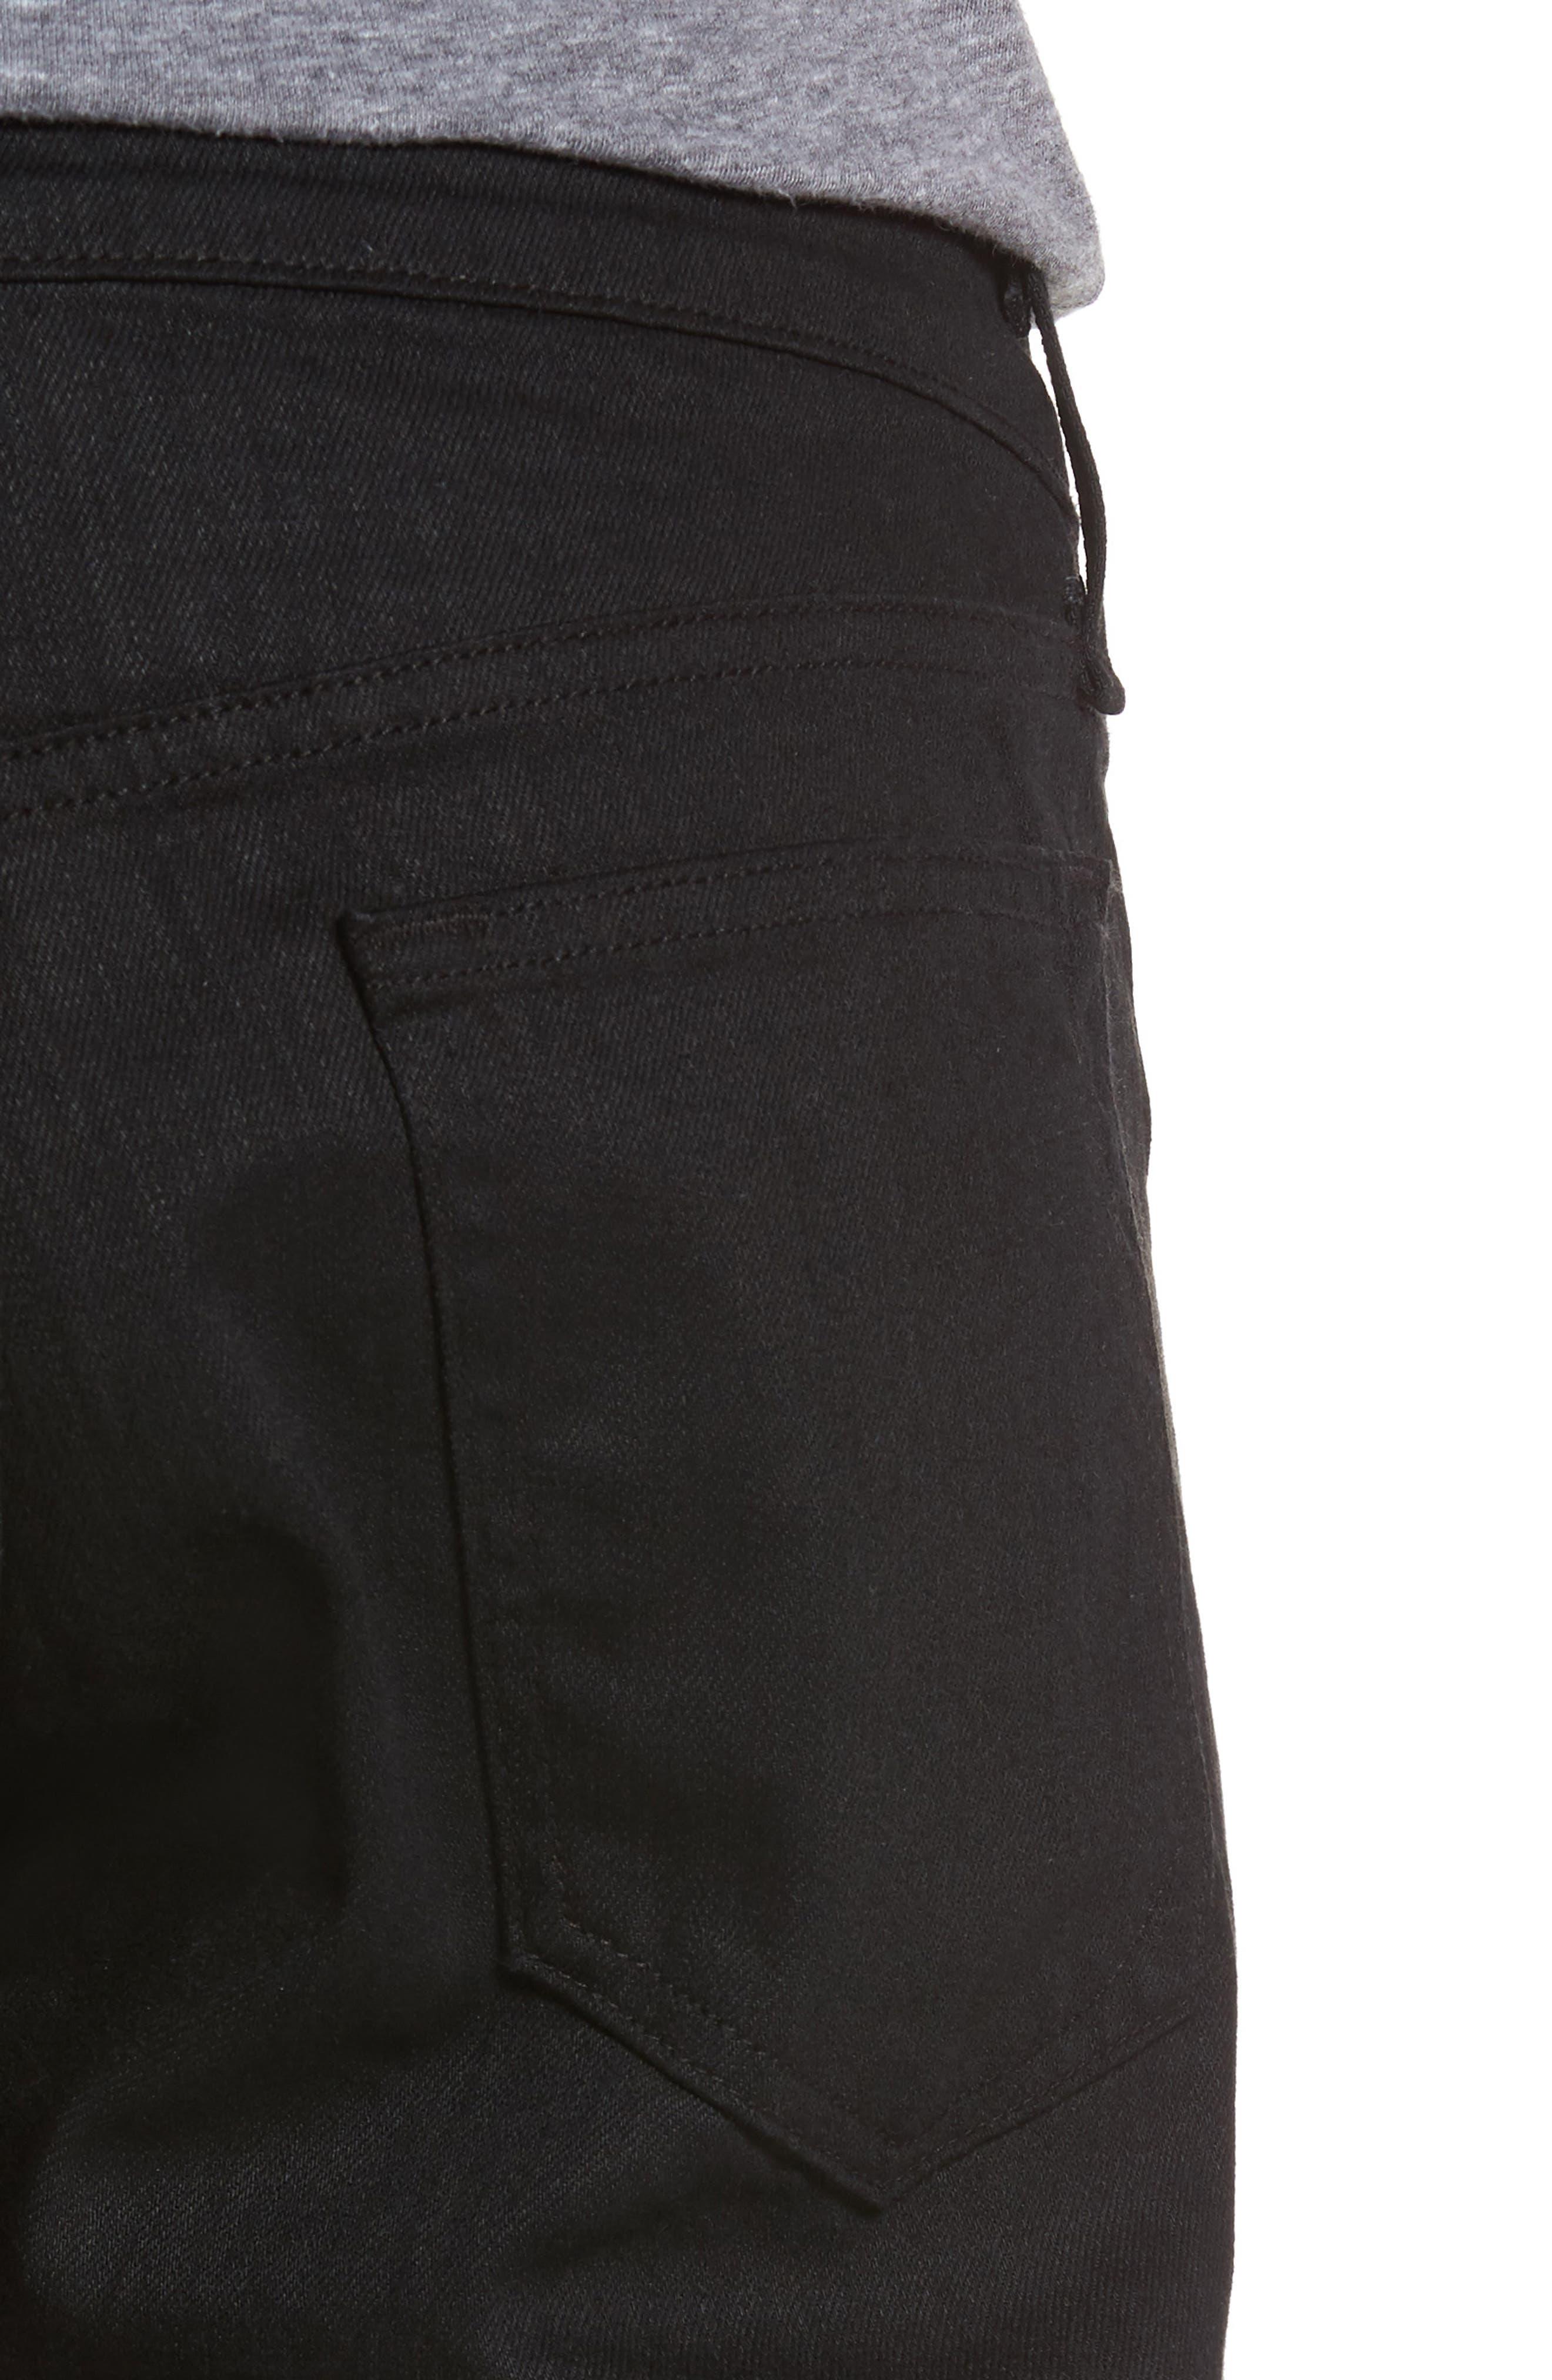 RAG & BONE, Fit 3 Slim Straight Leg Jeans, Alternate thumbnail 5, color, BLACK